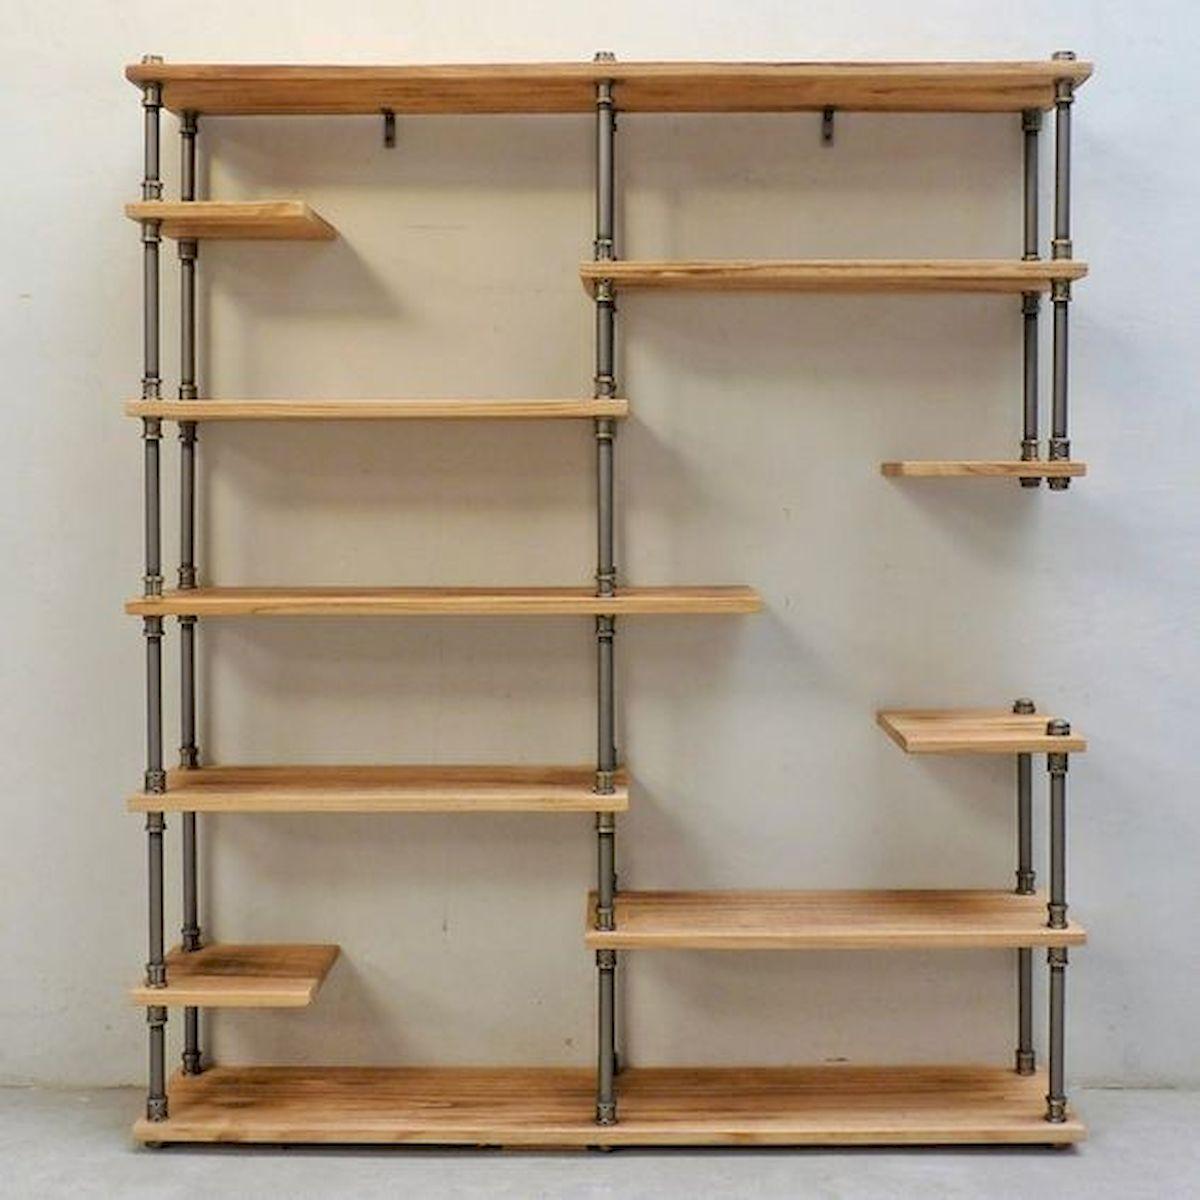 40 Inspiring DIY Garage Storage Design Ideas on a Budget (14)